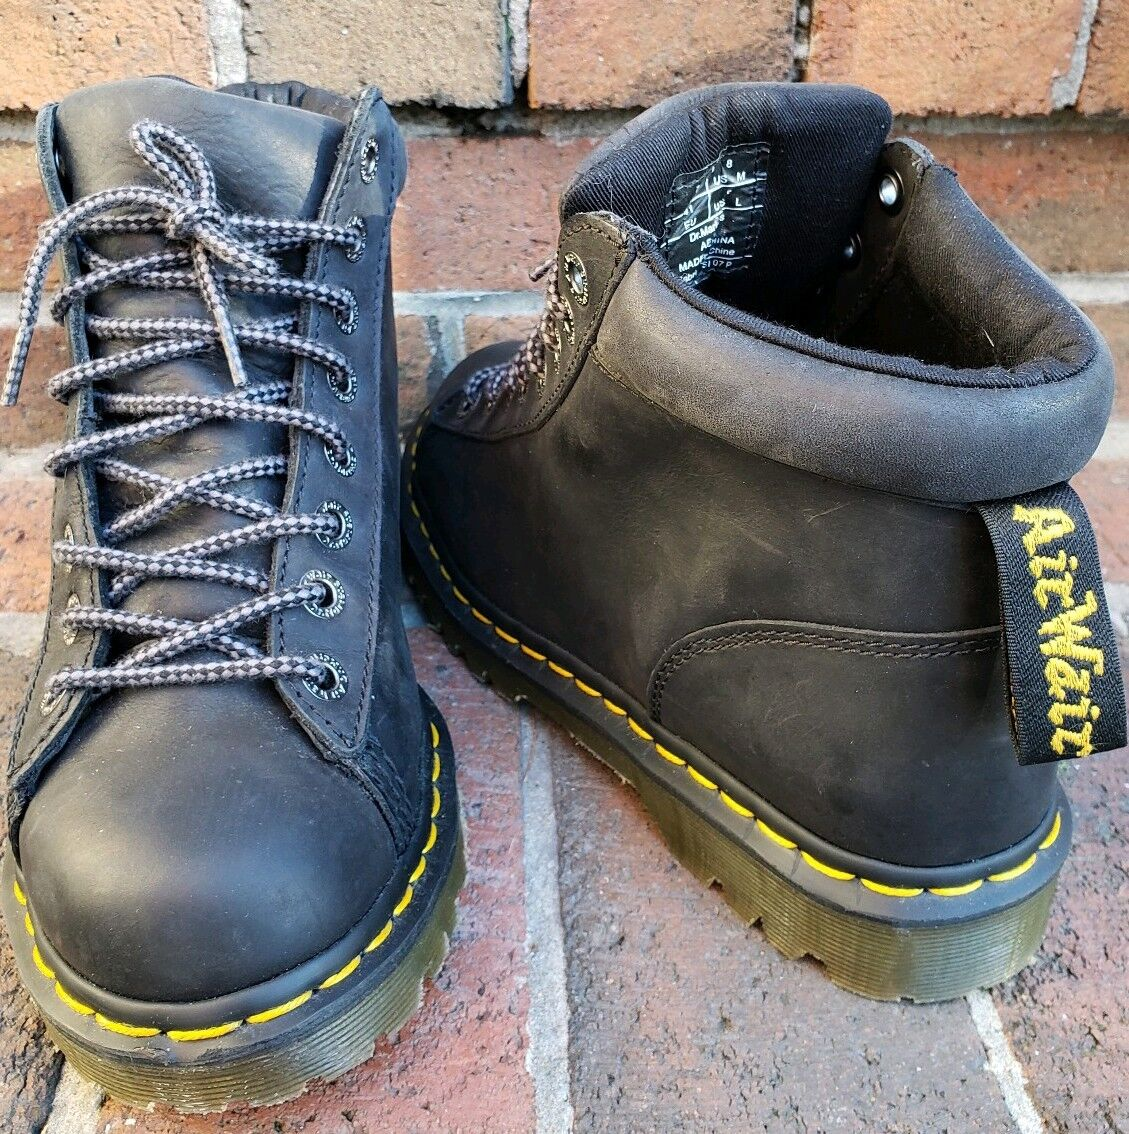 Dr. Doc Martens Arne Black Ankle Leather Boots US Mens 8 US W 9 EUC